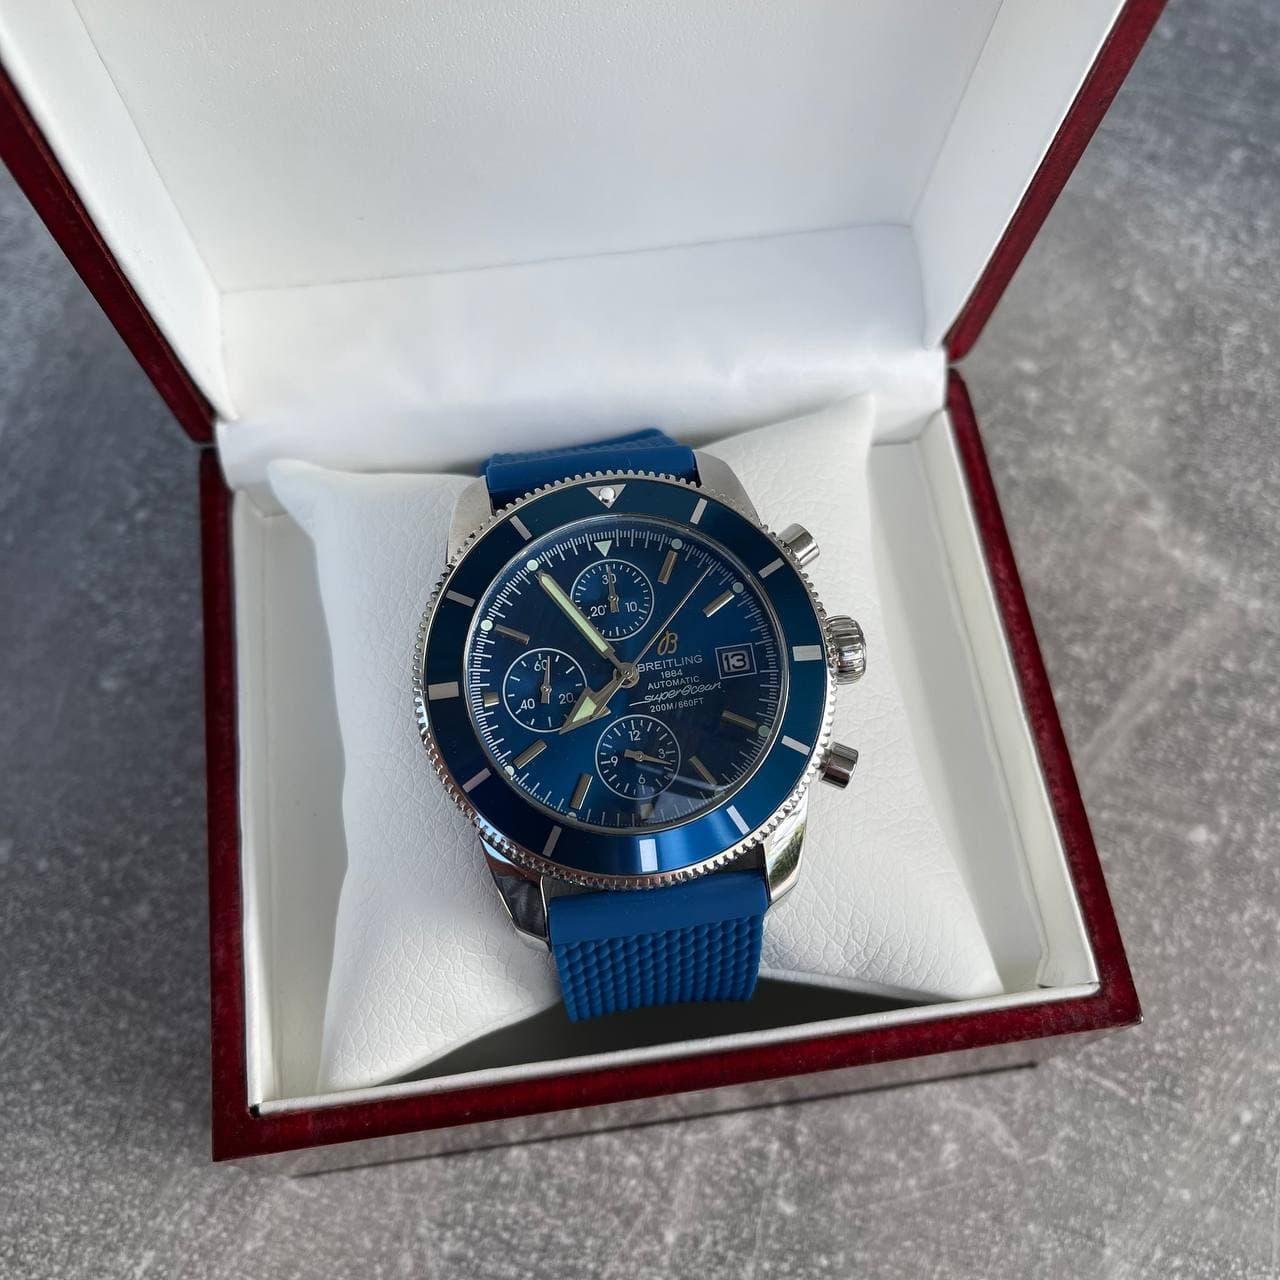 Годинник наручний Годинник Blue-Silver преміального класу ААА